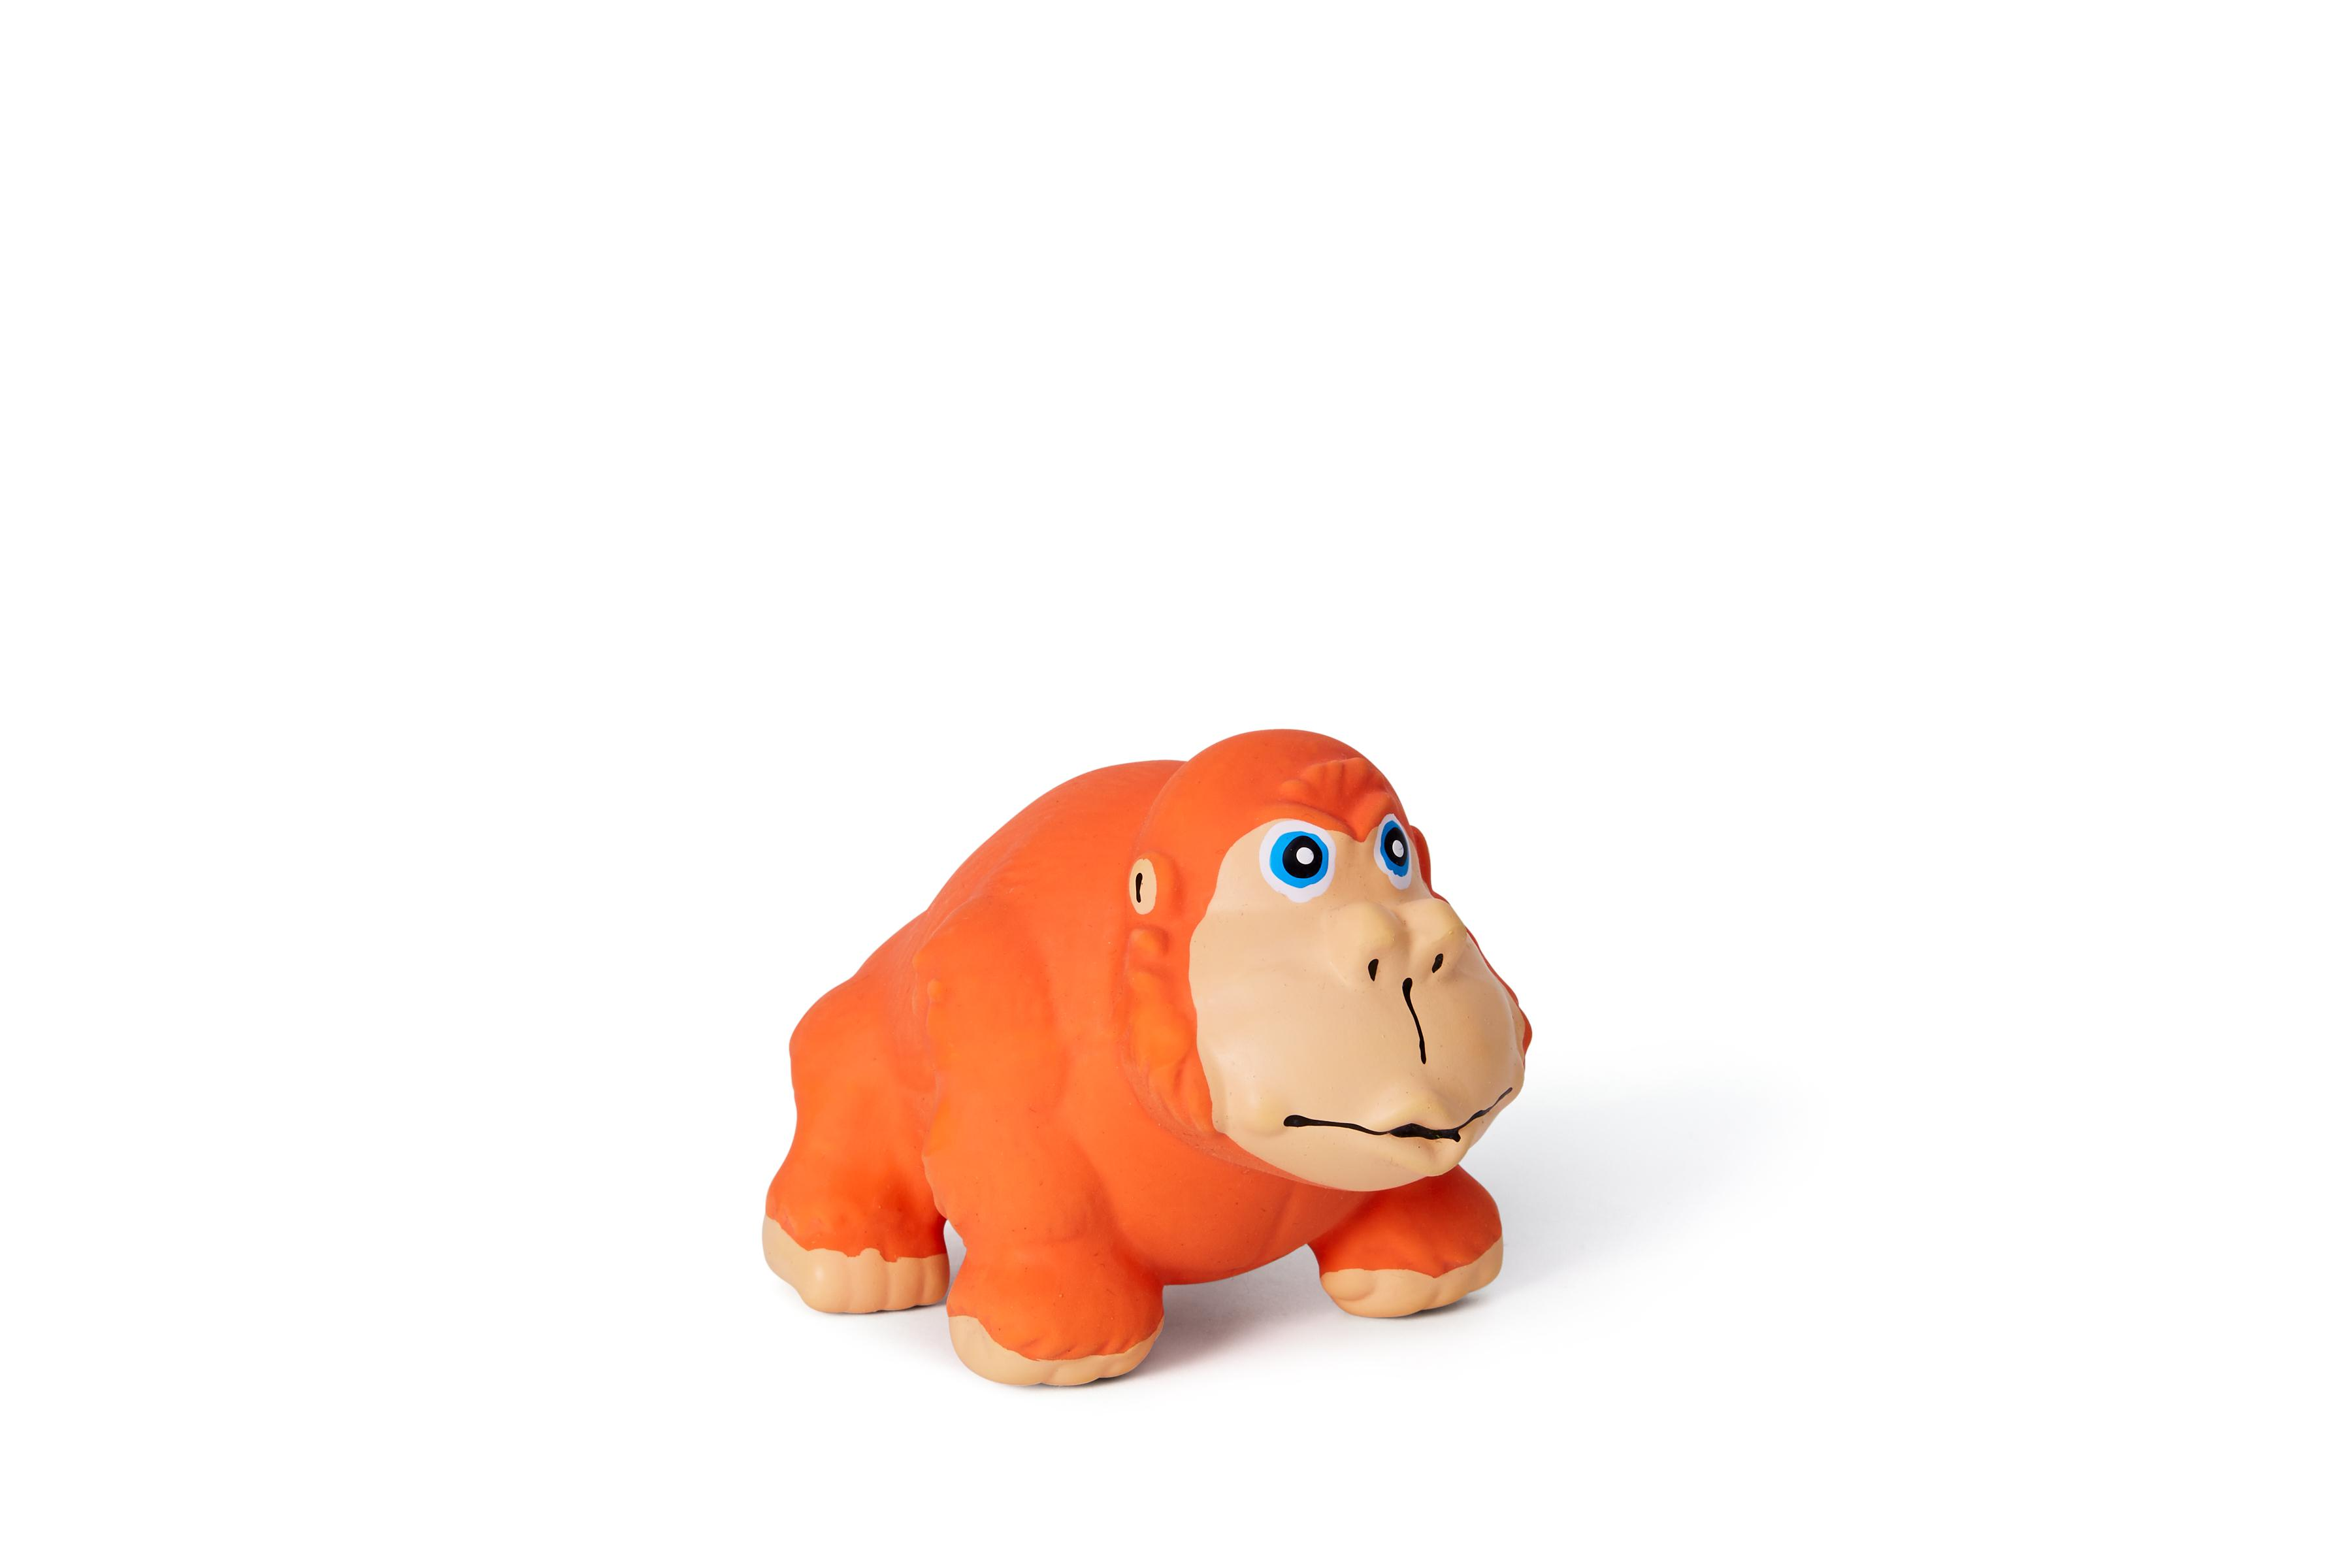 Bud'z Latex Gorilla Squeaker Dog Toy, 11.5-cm (Size: 11.5-cm) Image